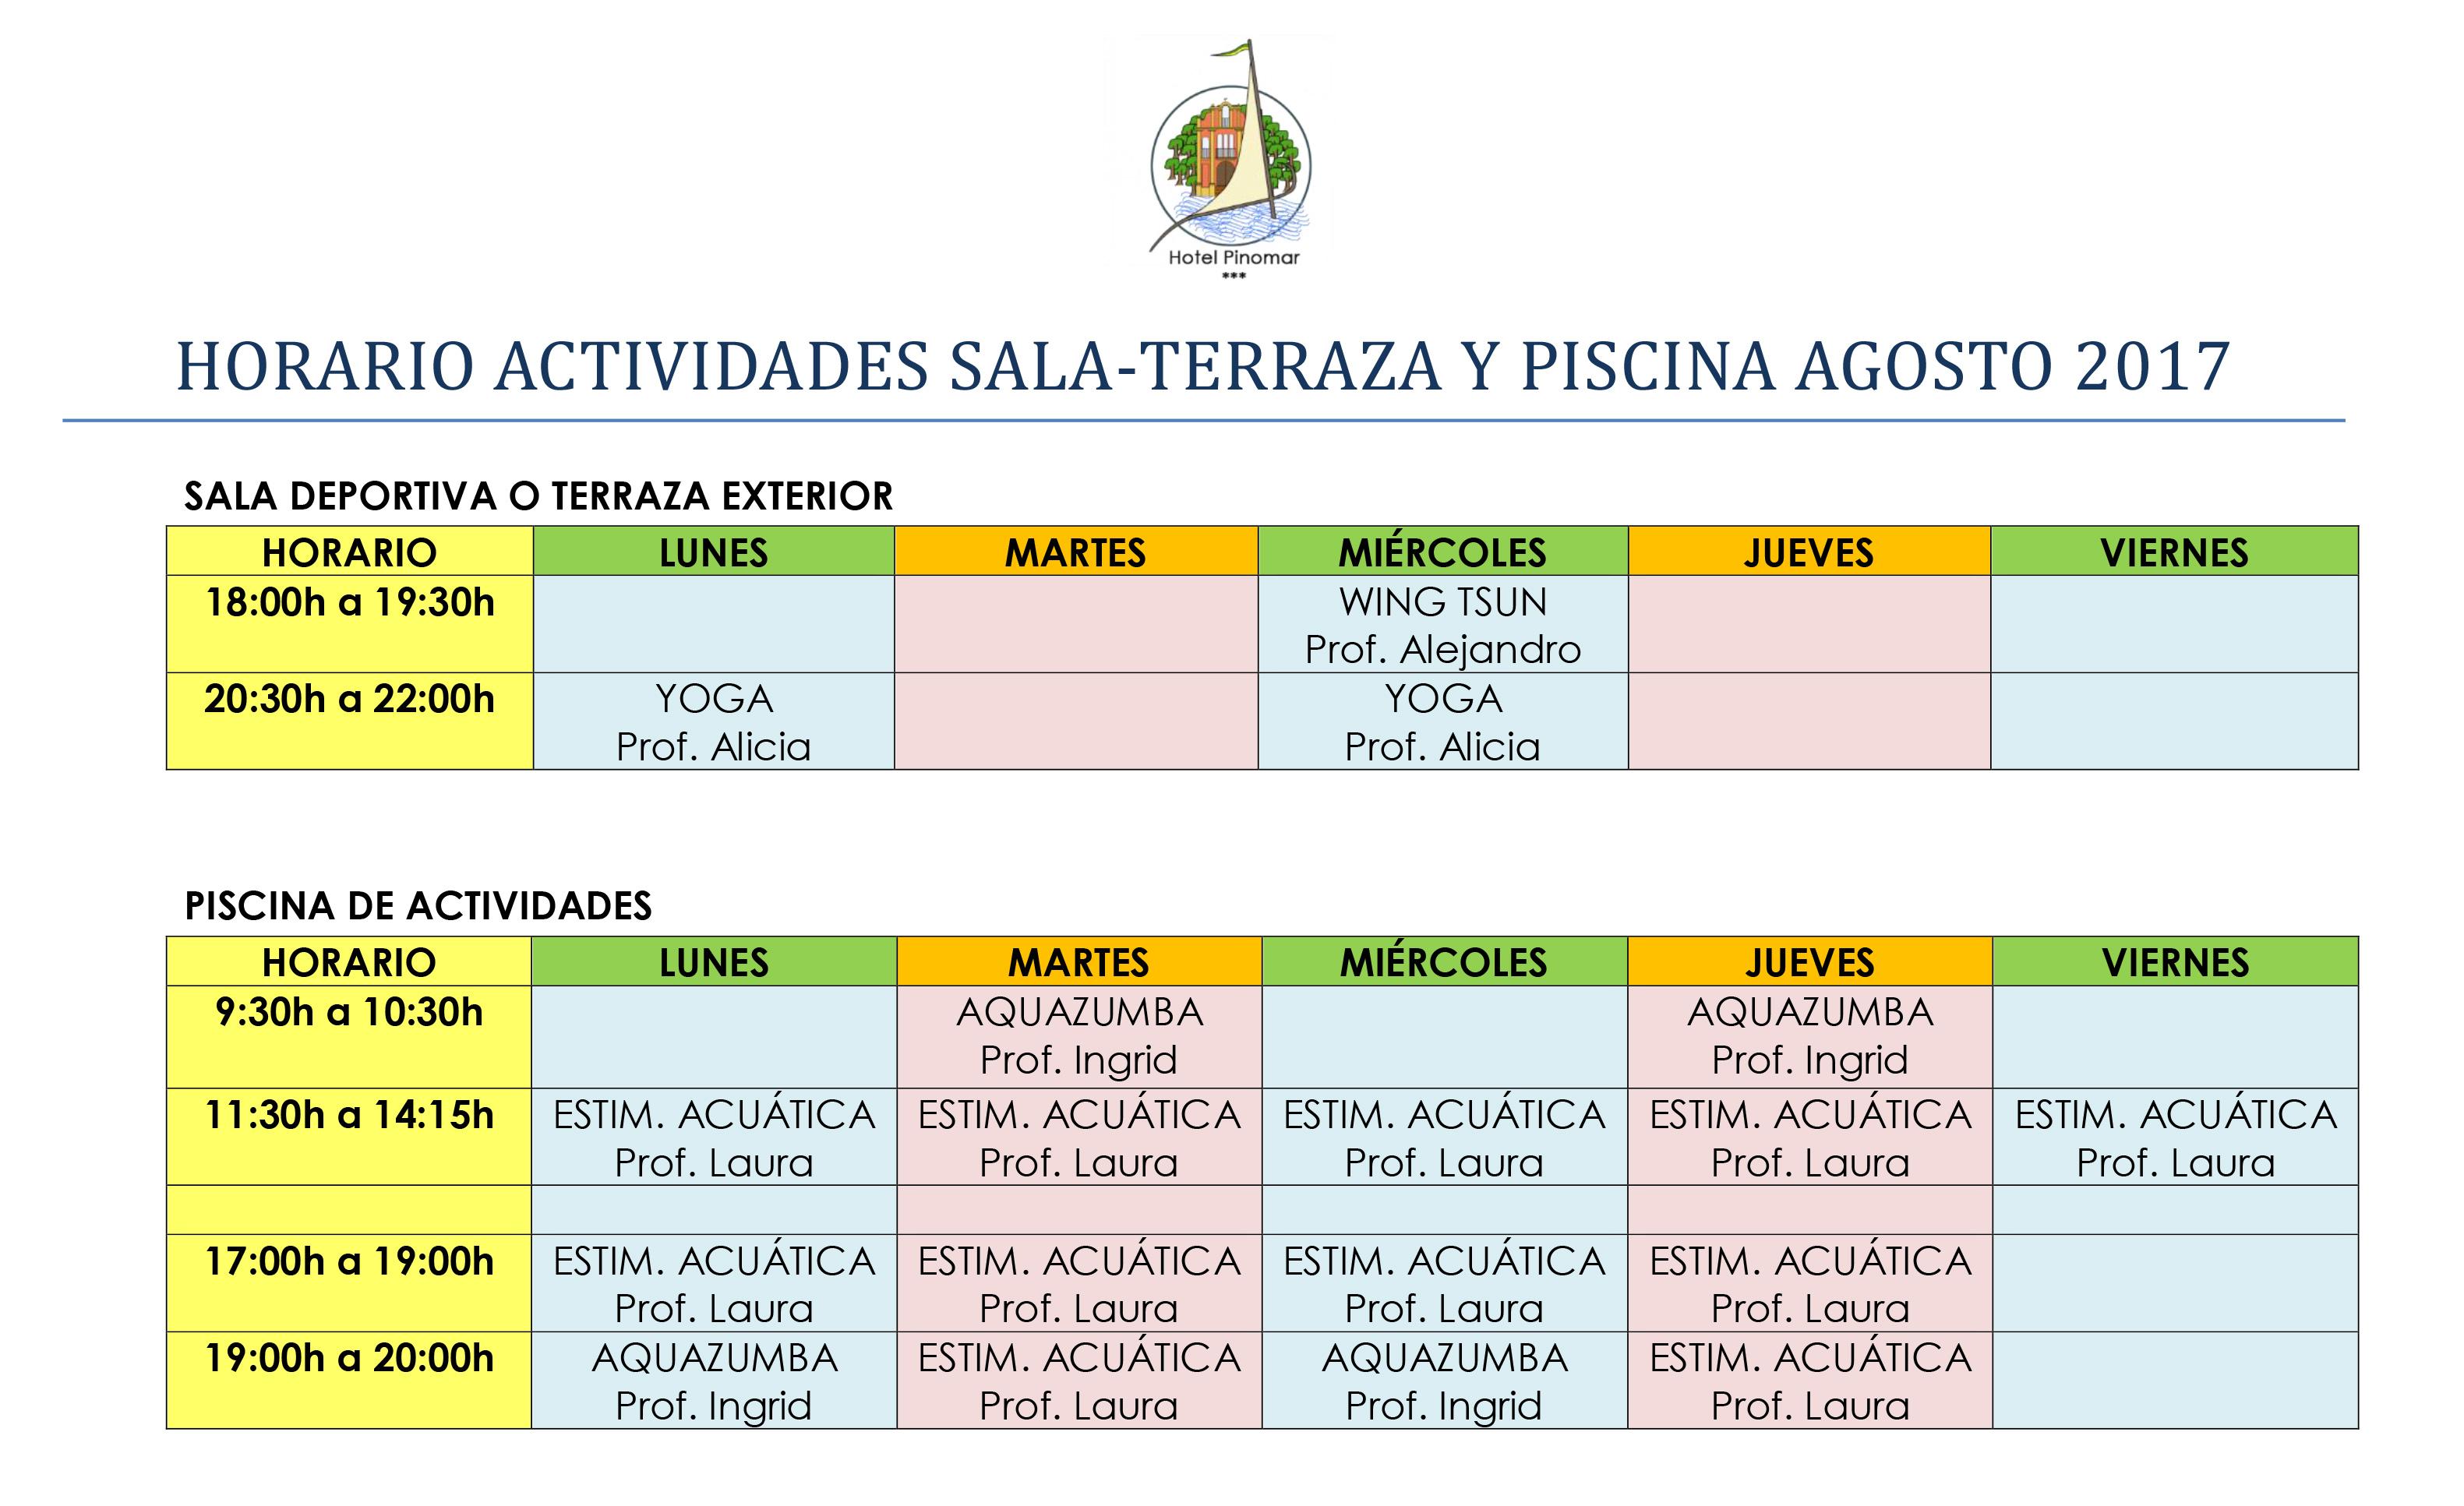 HORARIO ACTIVIDADES DIRIGIDAS AGOSTO 2017